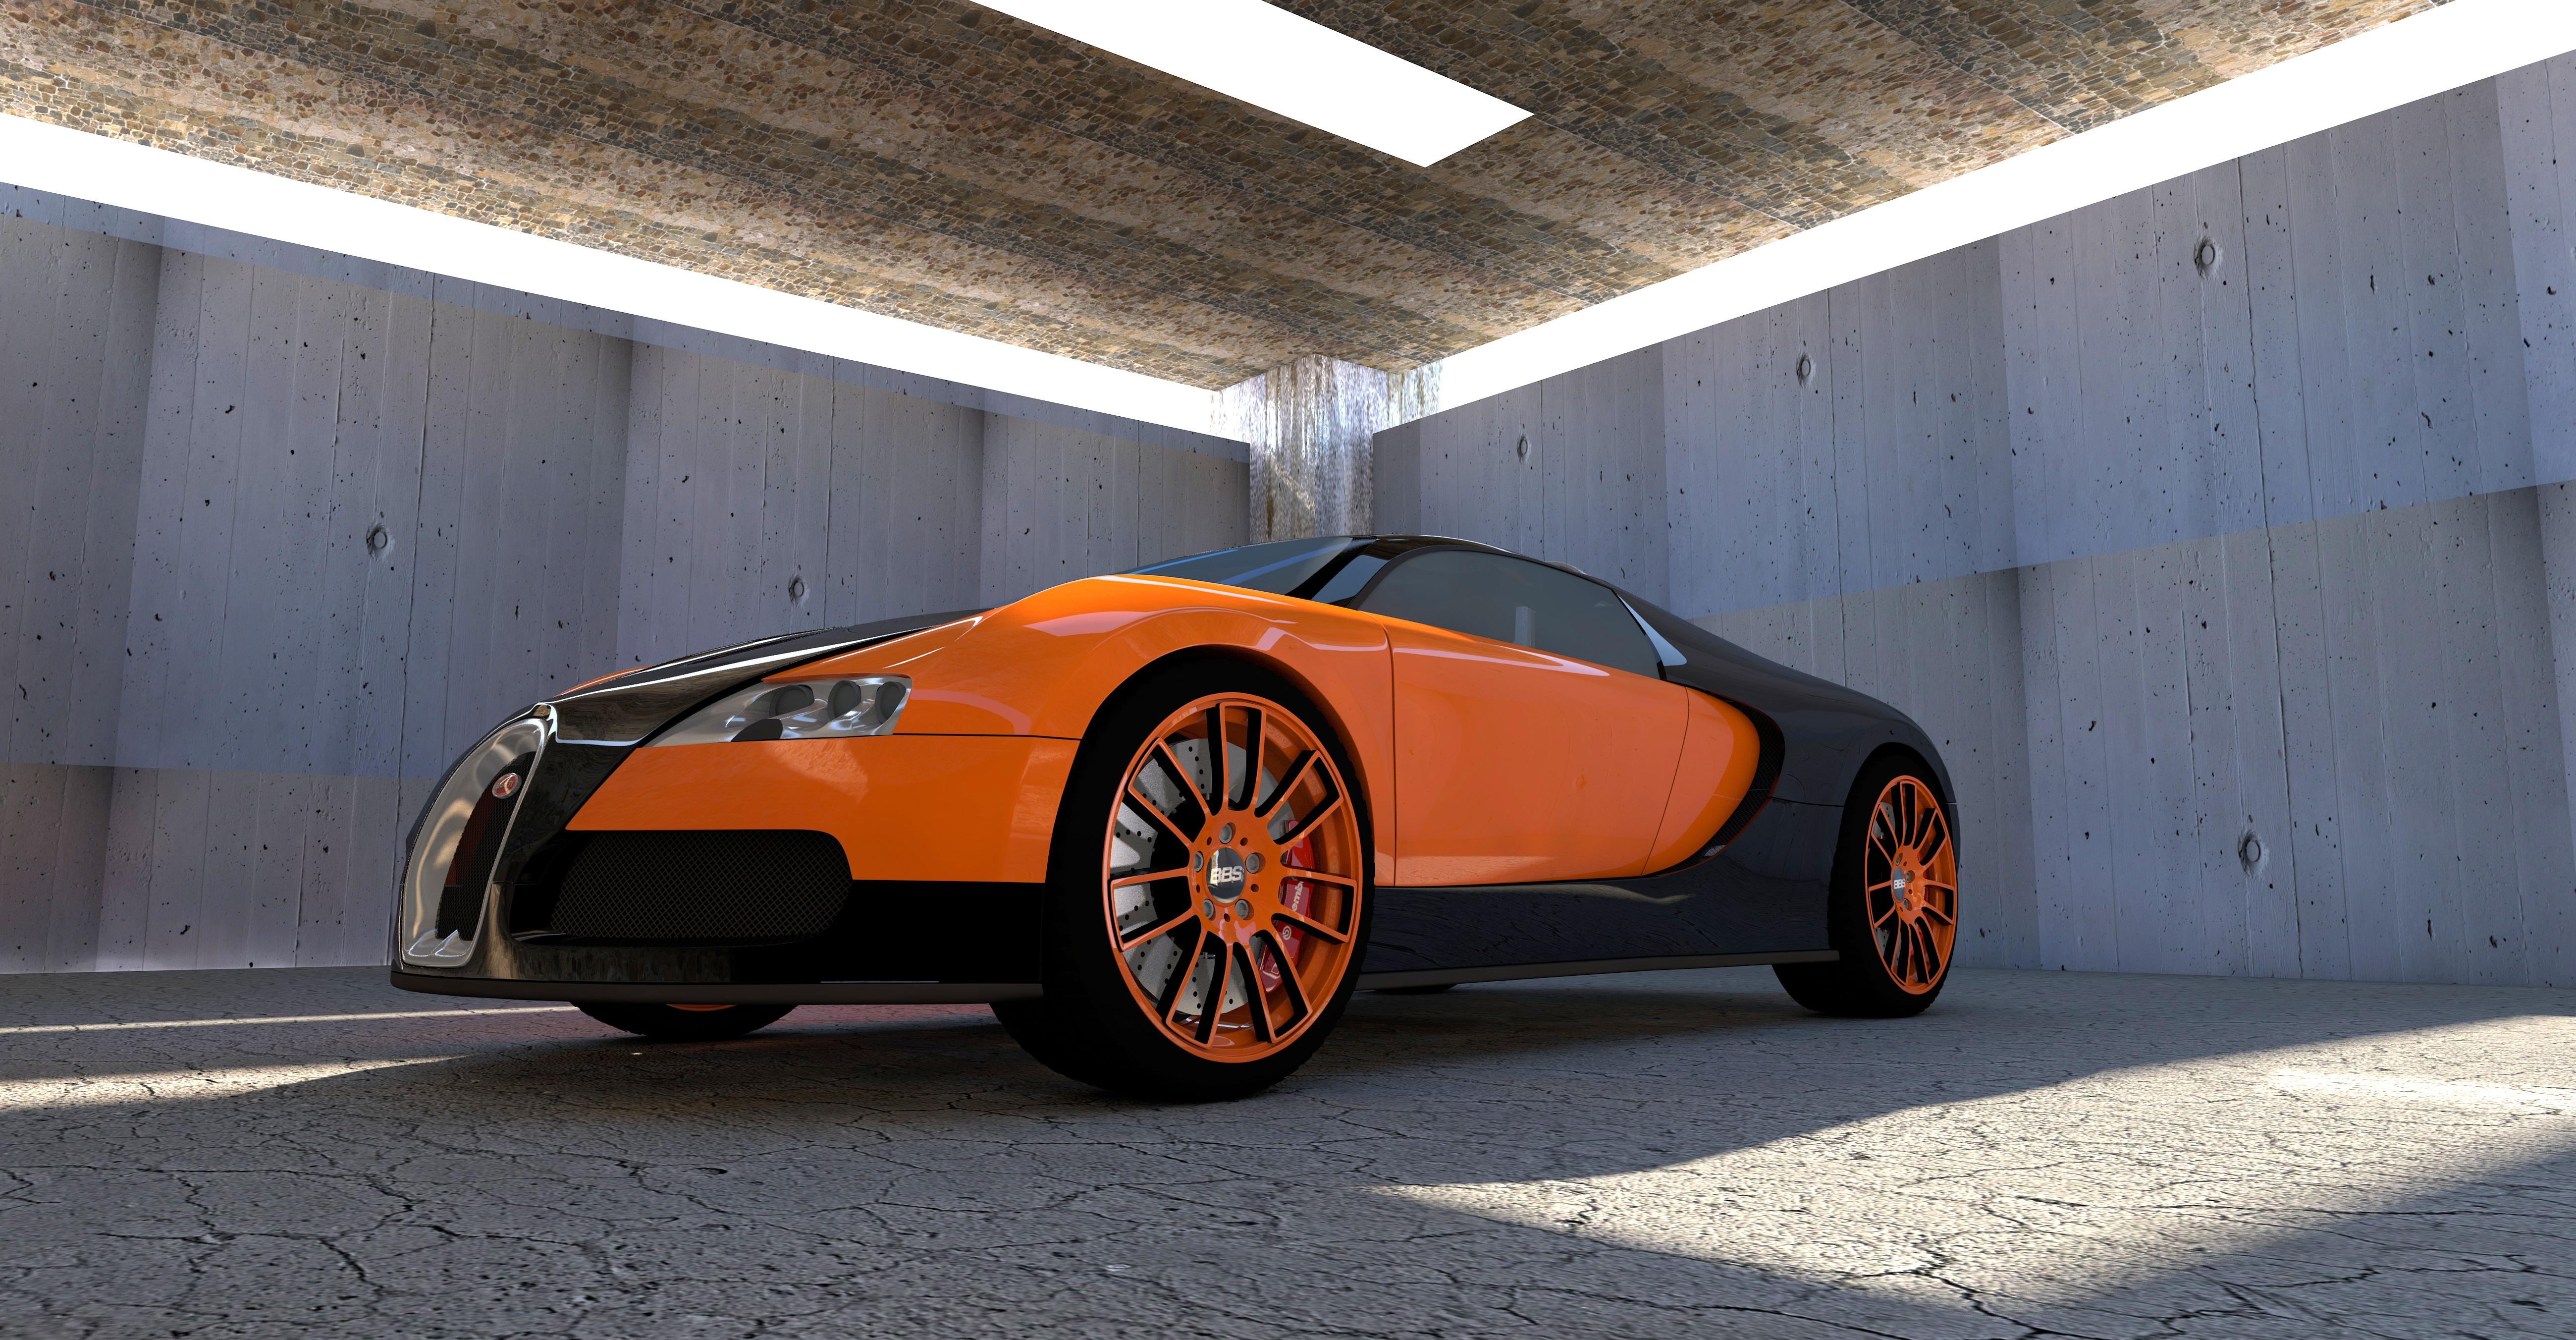 Free Images : wheel, texture, hall, shadow, auto, machine